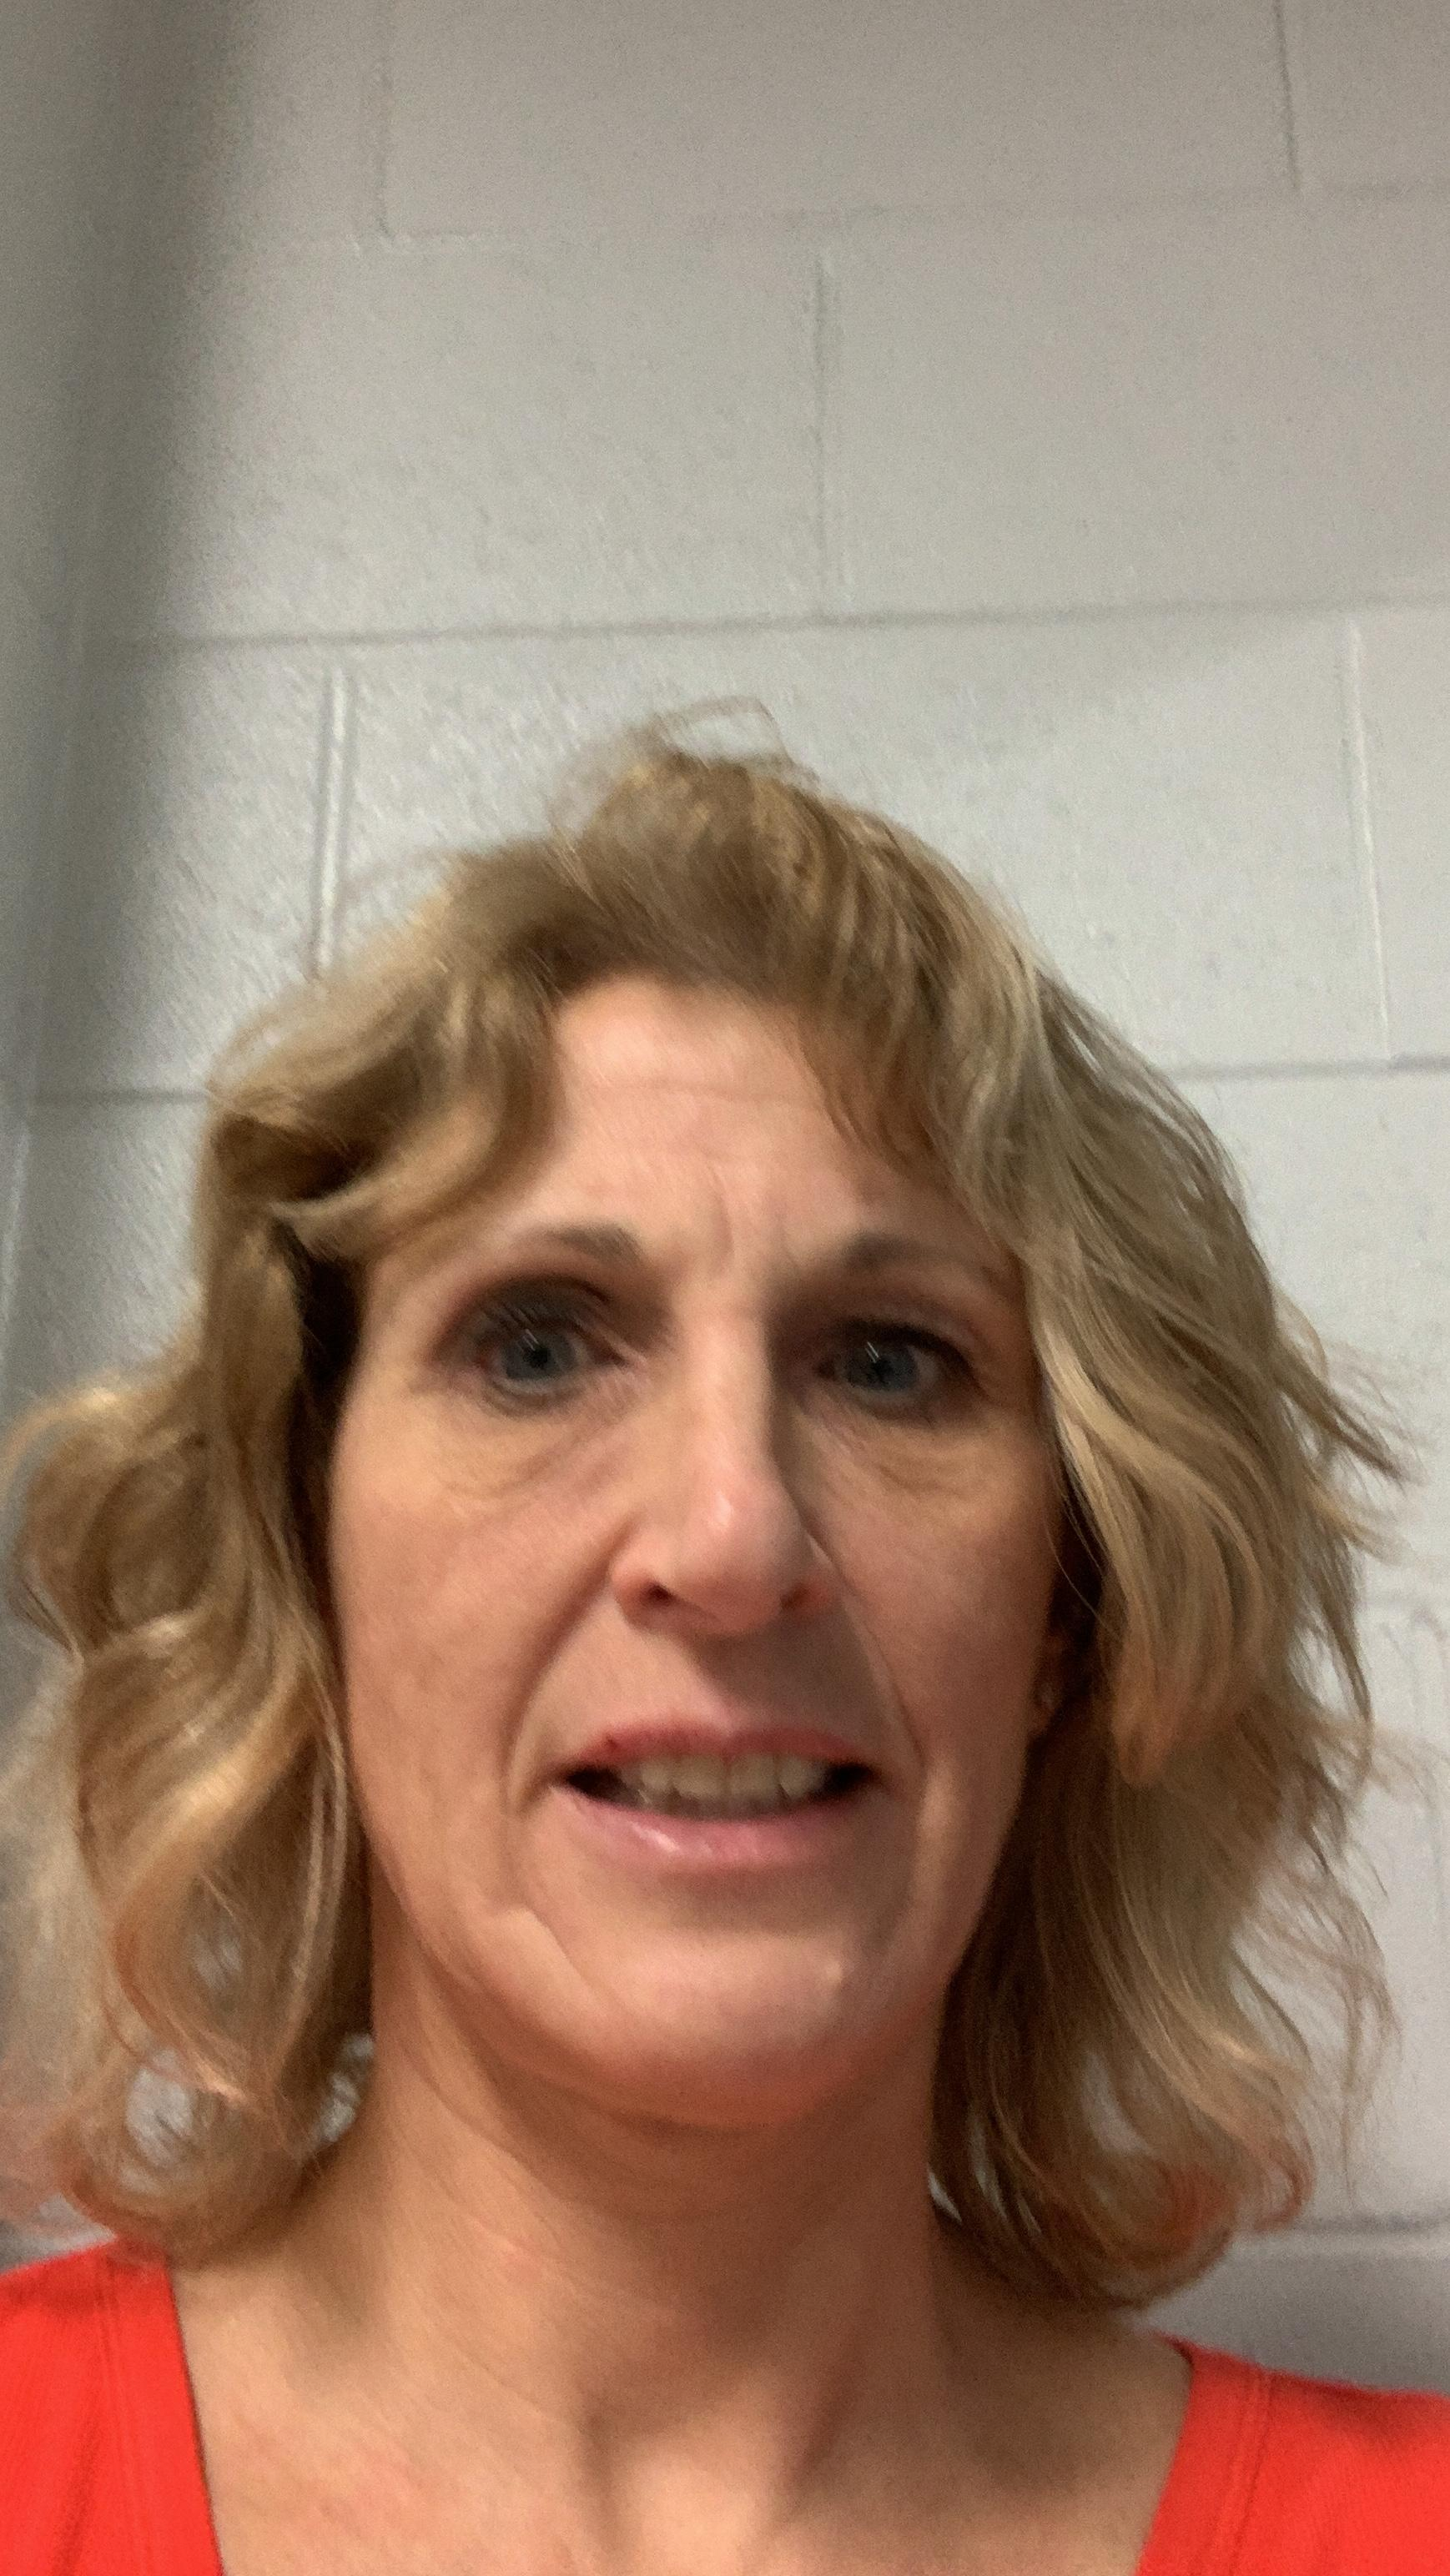 Mrs. Hinnegan